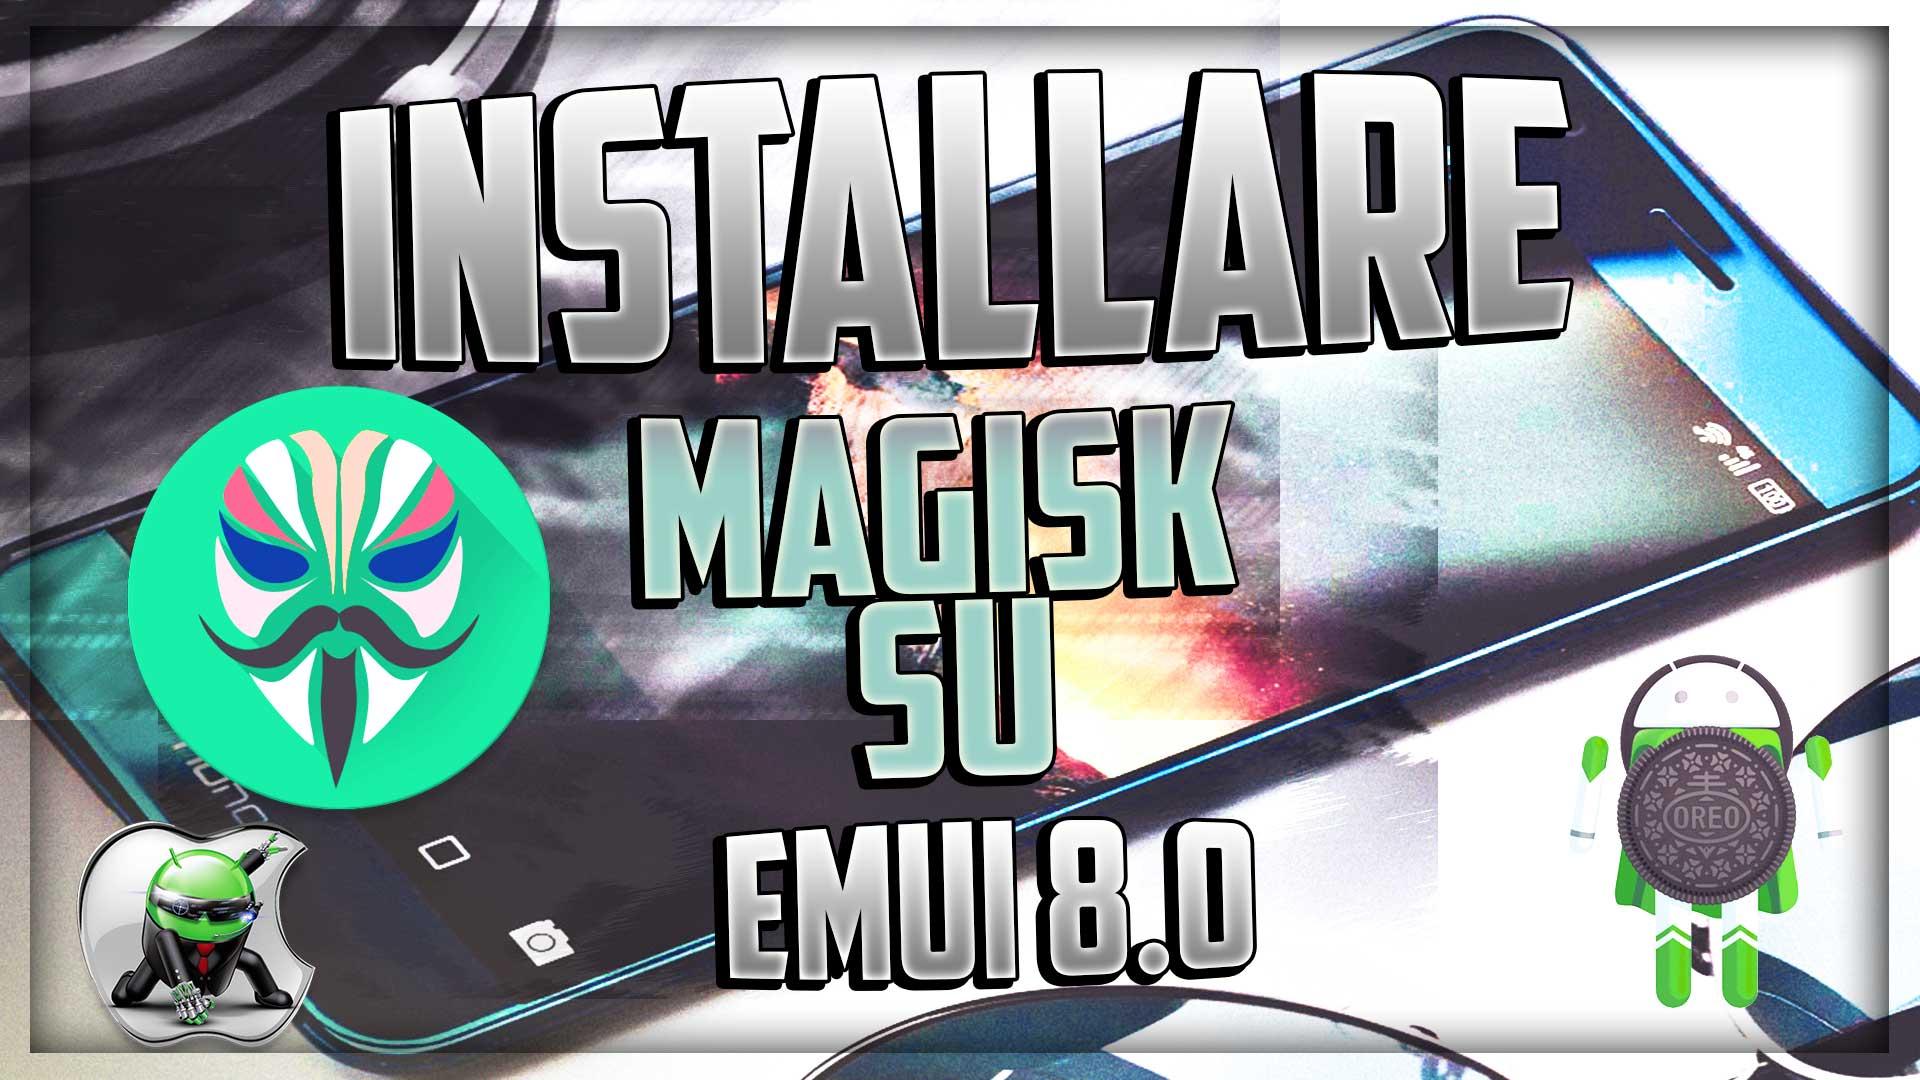 Come Installare Magisk su Emui 8.0